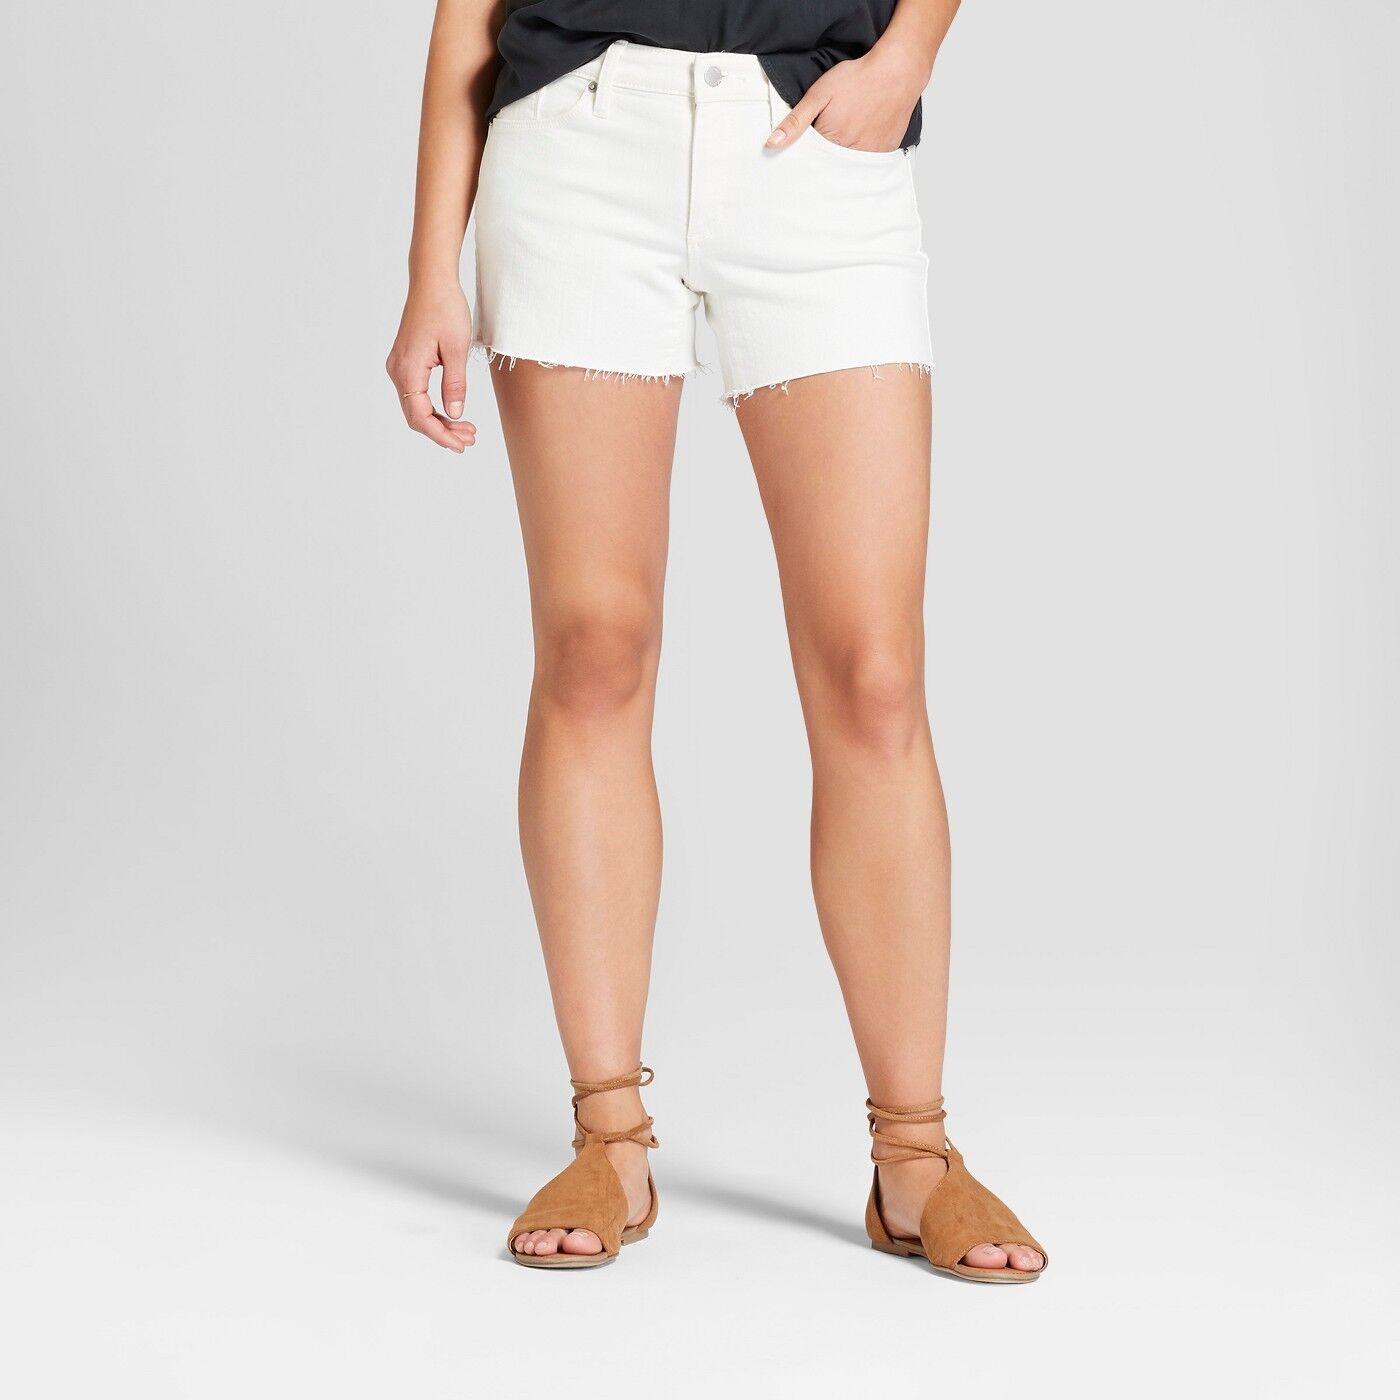 fbee62f7220 Details about NWT Women's Mid-Rise Raw Hem Midi Jean Shorts - Universal  Thread White